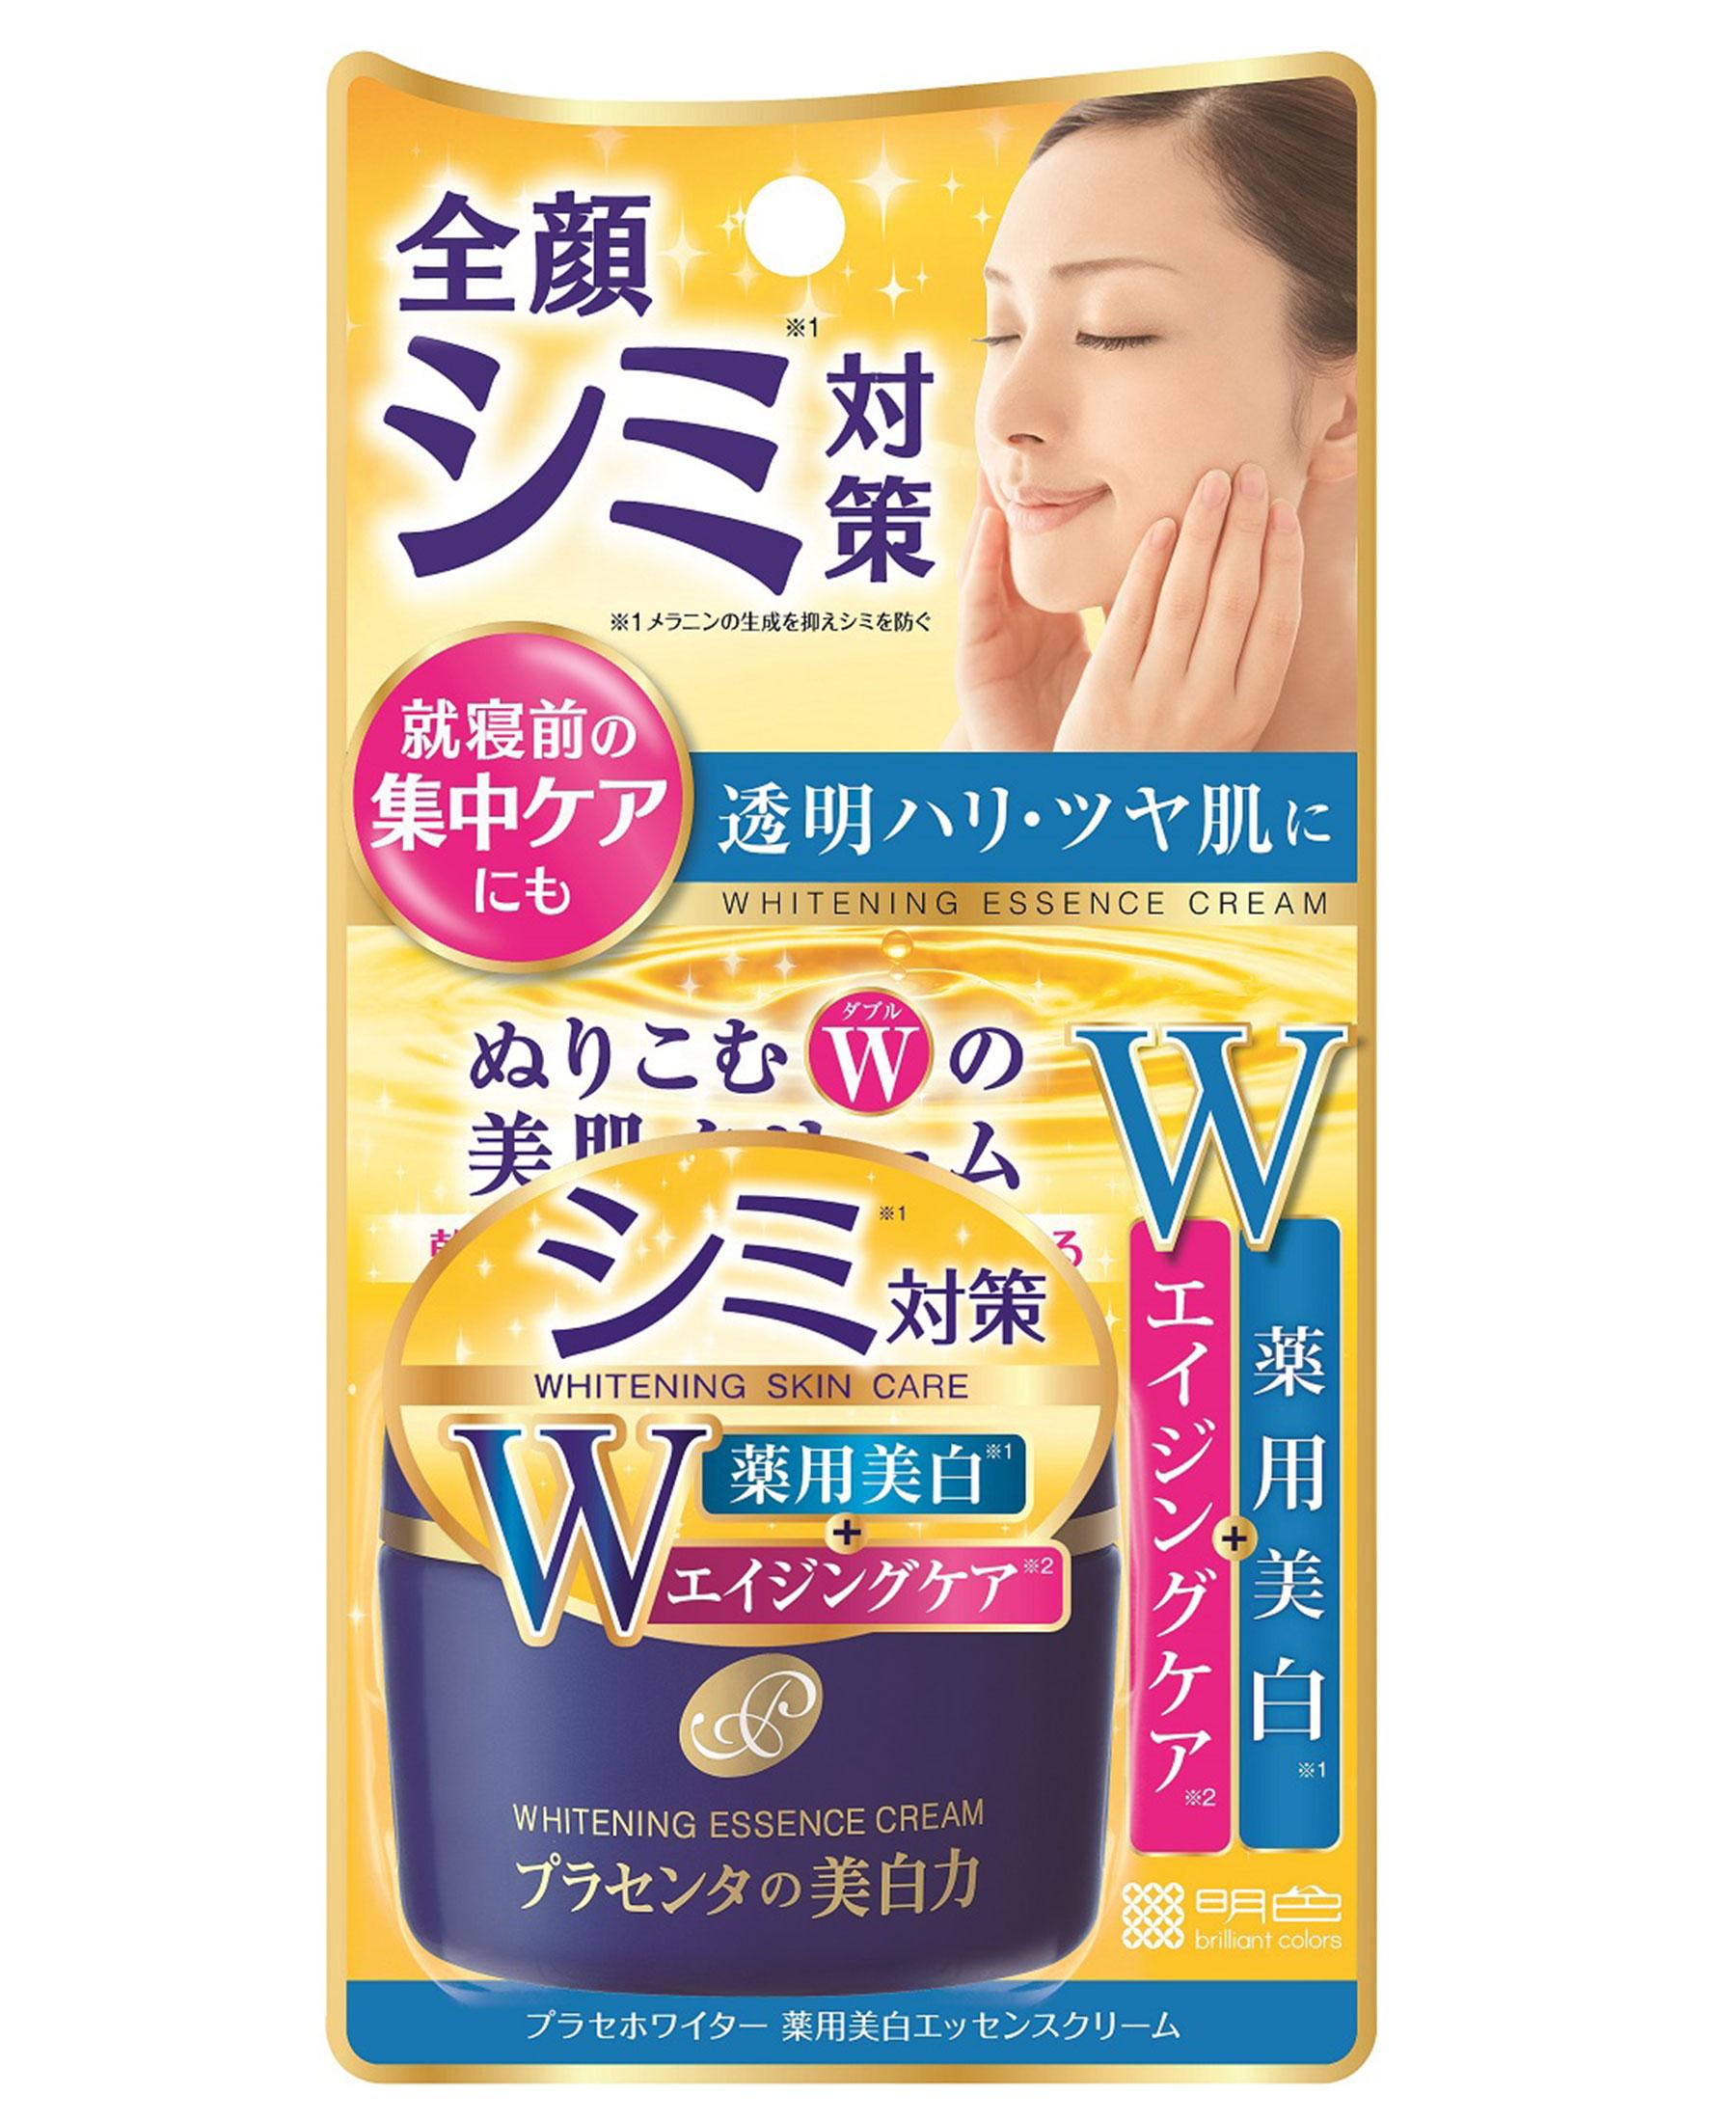 Kem Dưỡng Trắng MEISHOKU Placewhiter Essence Cream 50g